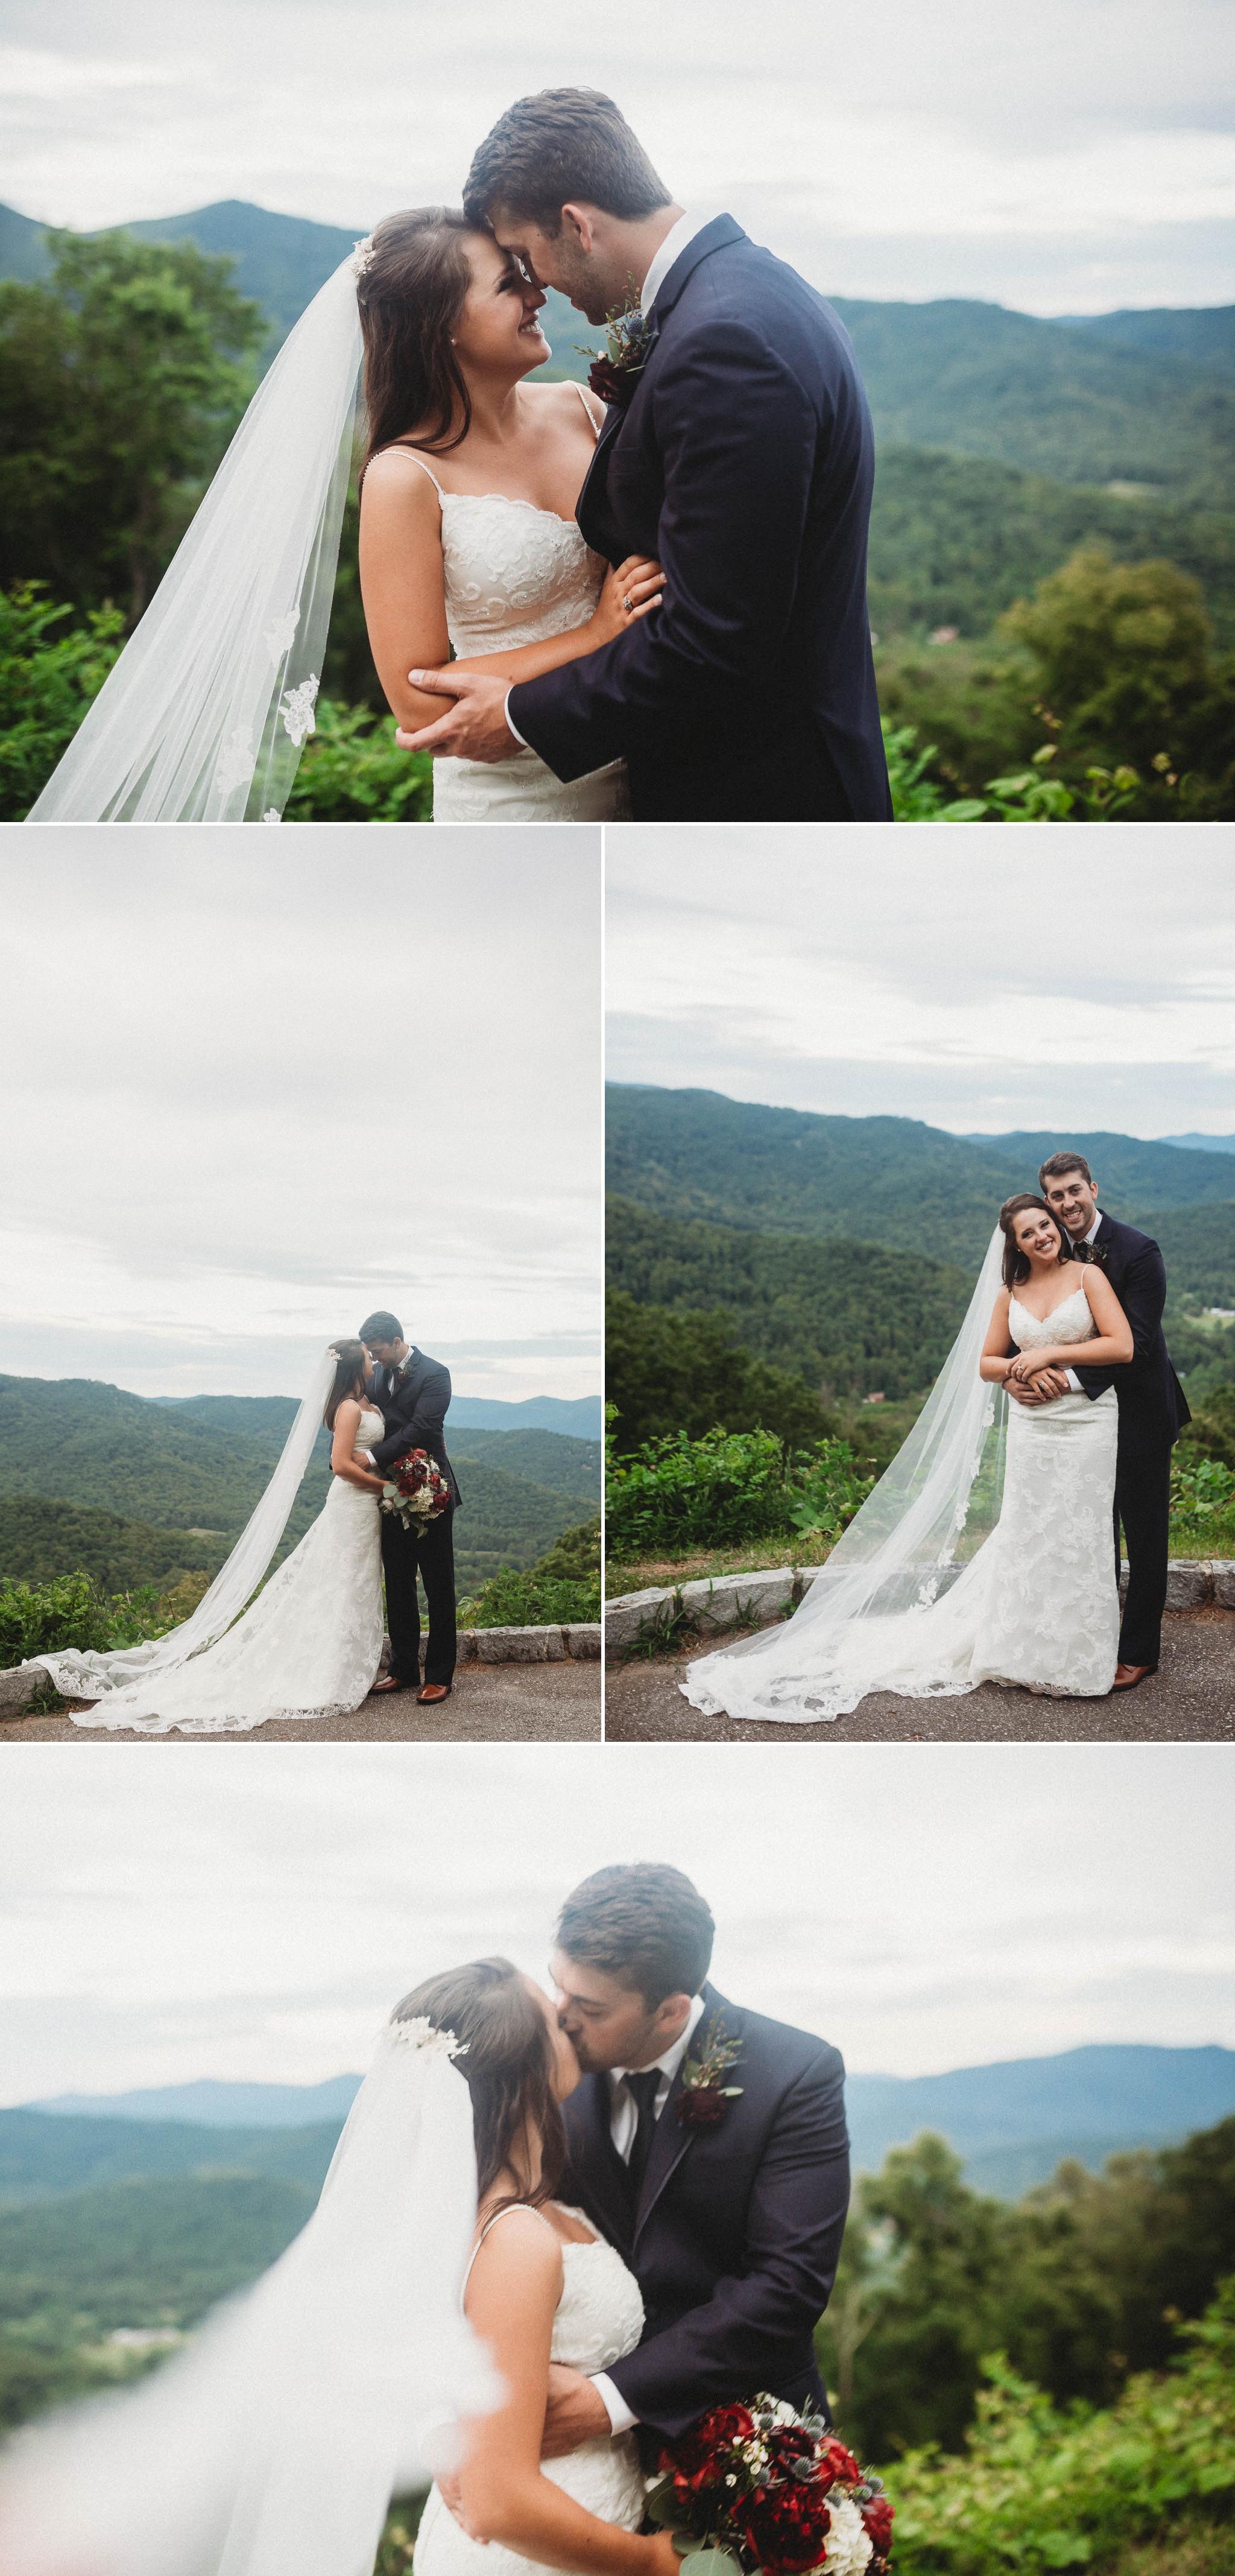 Portraits of Bride and Groom Megan + Jon - Run away Elopement at the Blue Ridge Park Way in Asheville, North Carolina